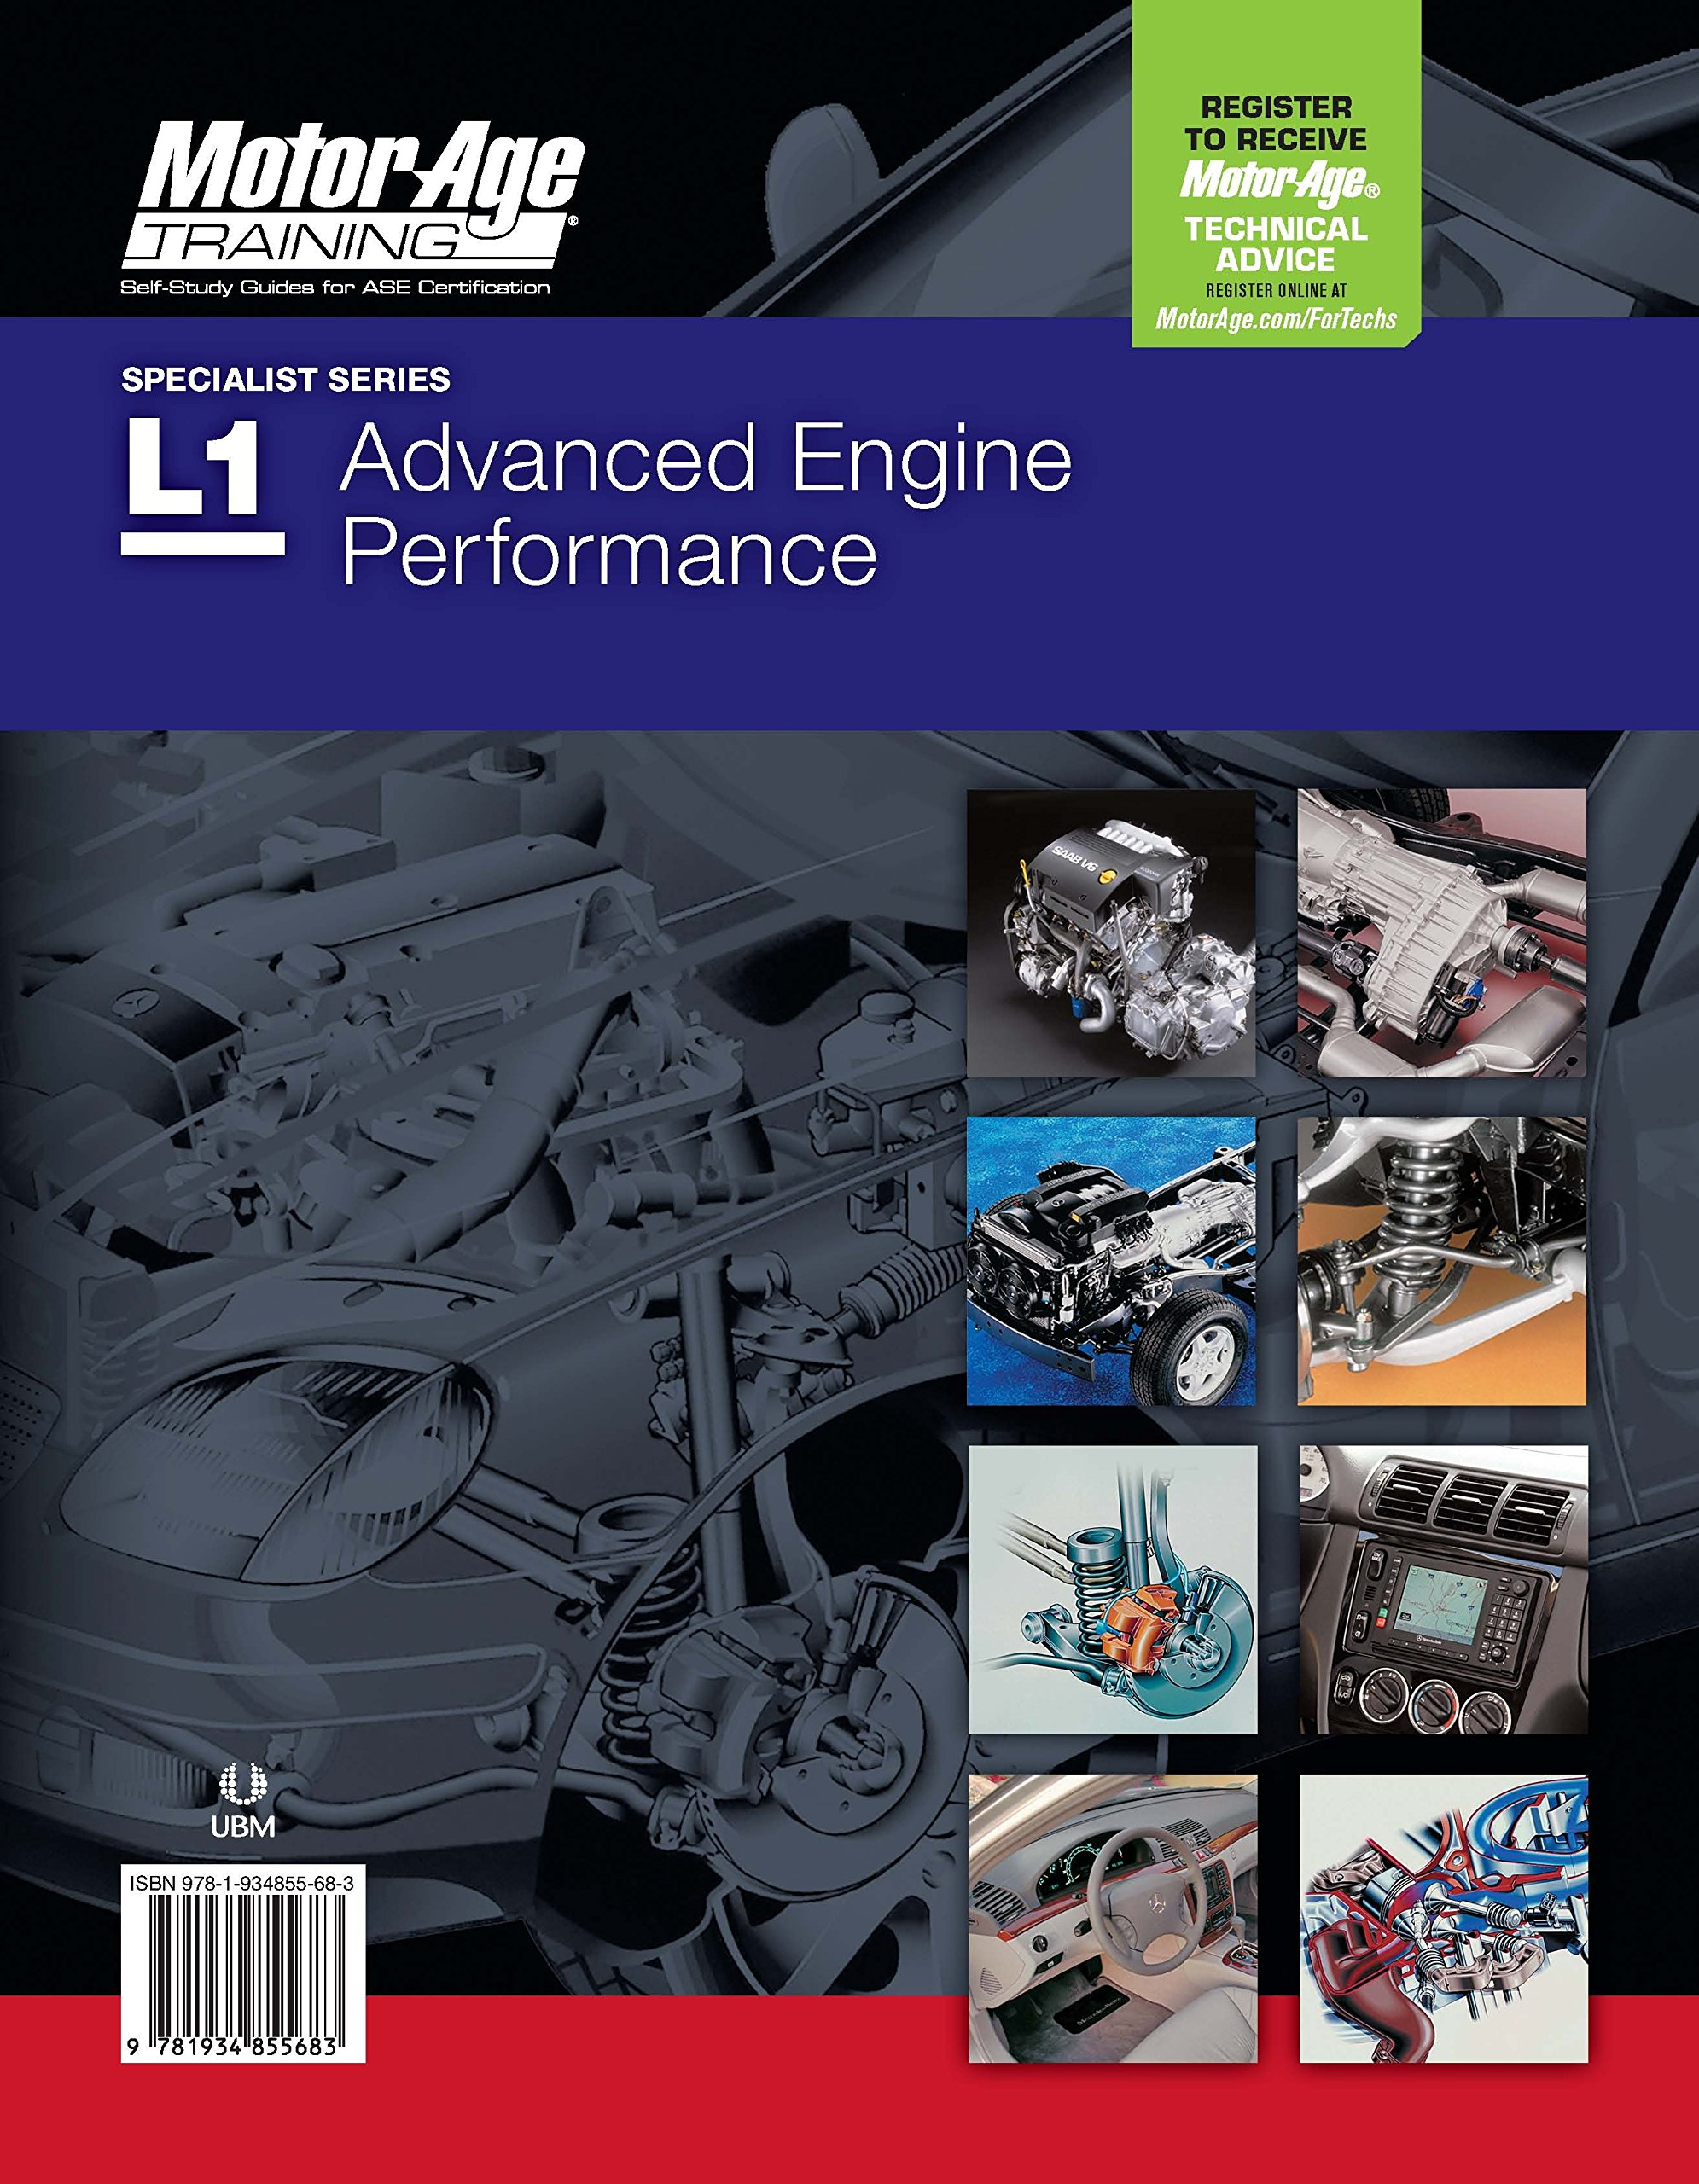 ASE L1 Test Prep - Advanced Engine Performance Specialist Study Guide  (Motor Age Training): 9781934855218: Amazon.com: Books